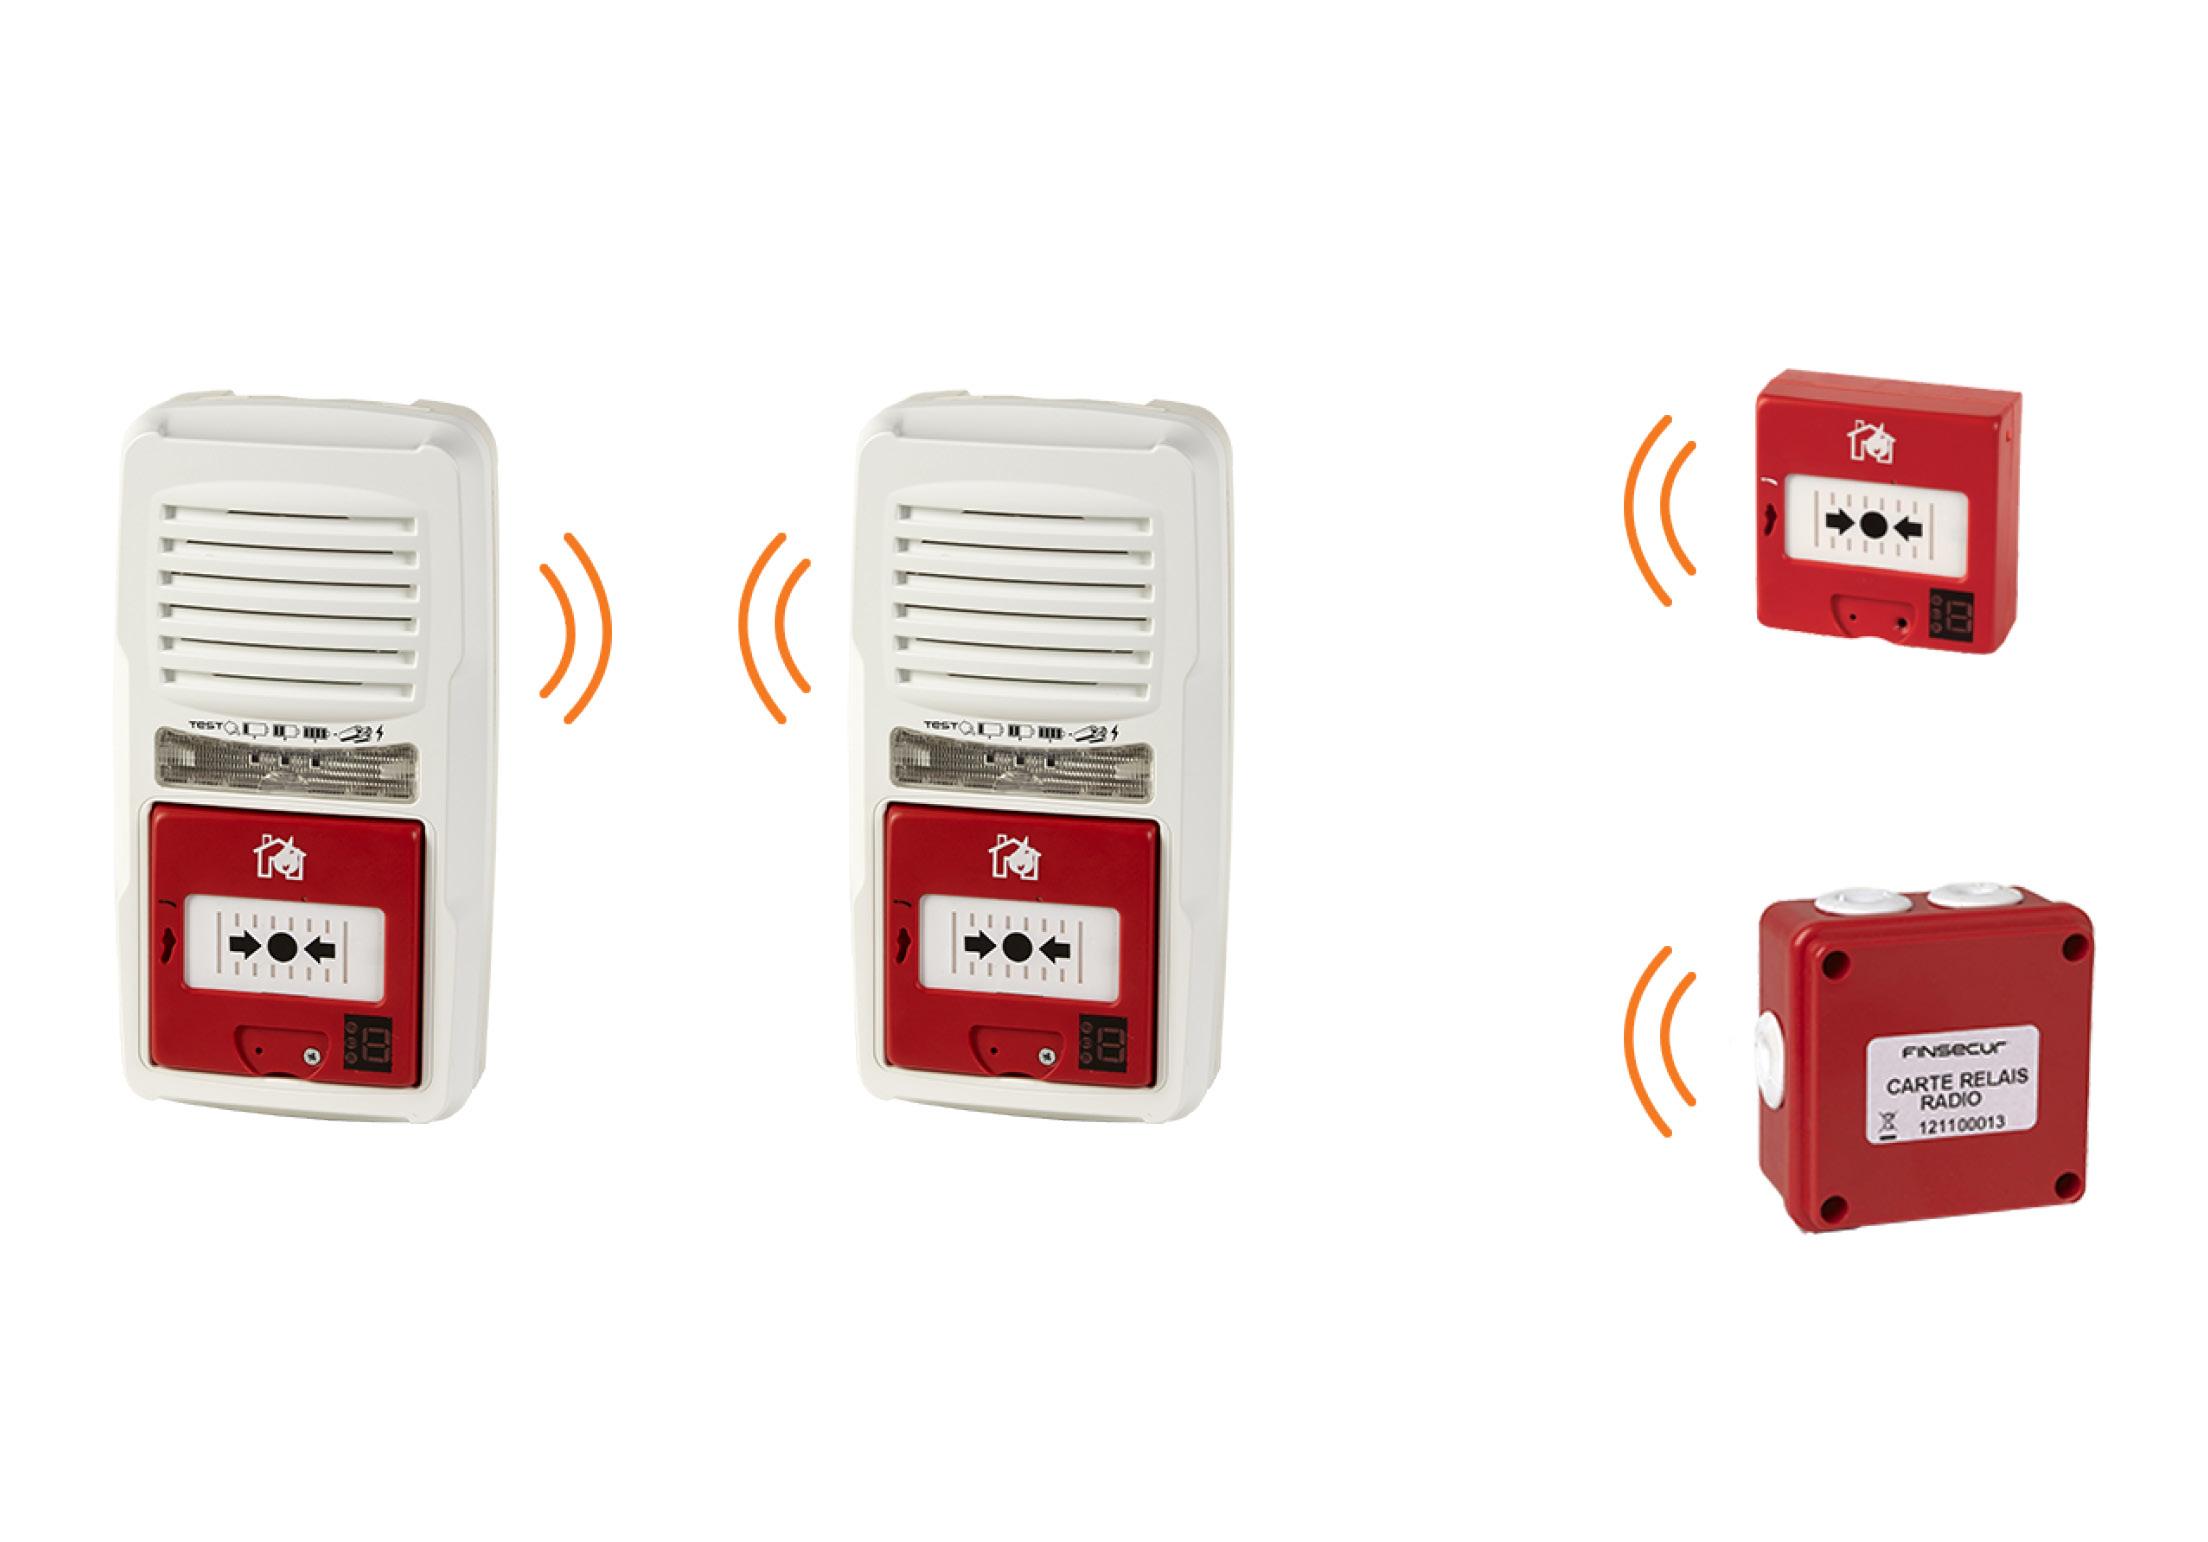 Iroise-II® radio longue portée